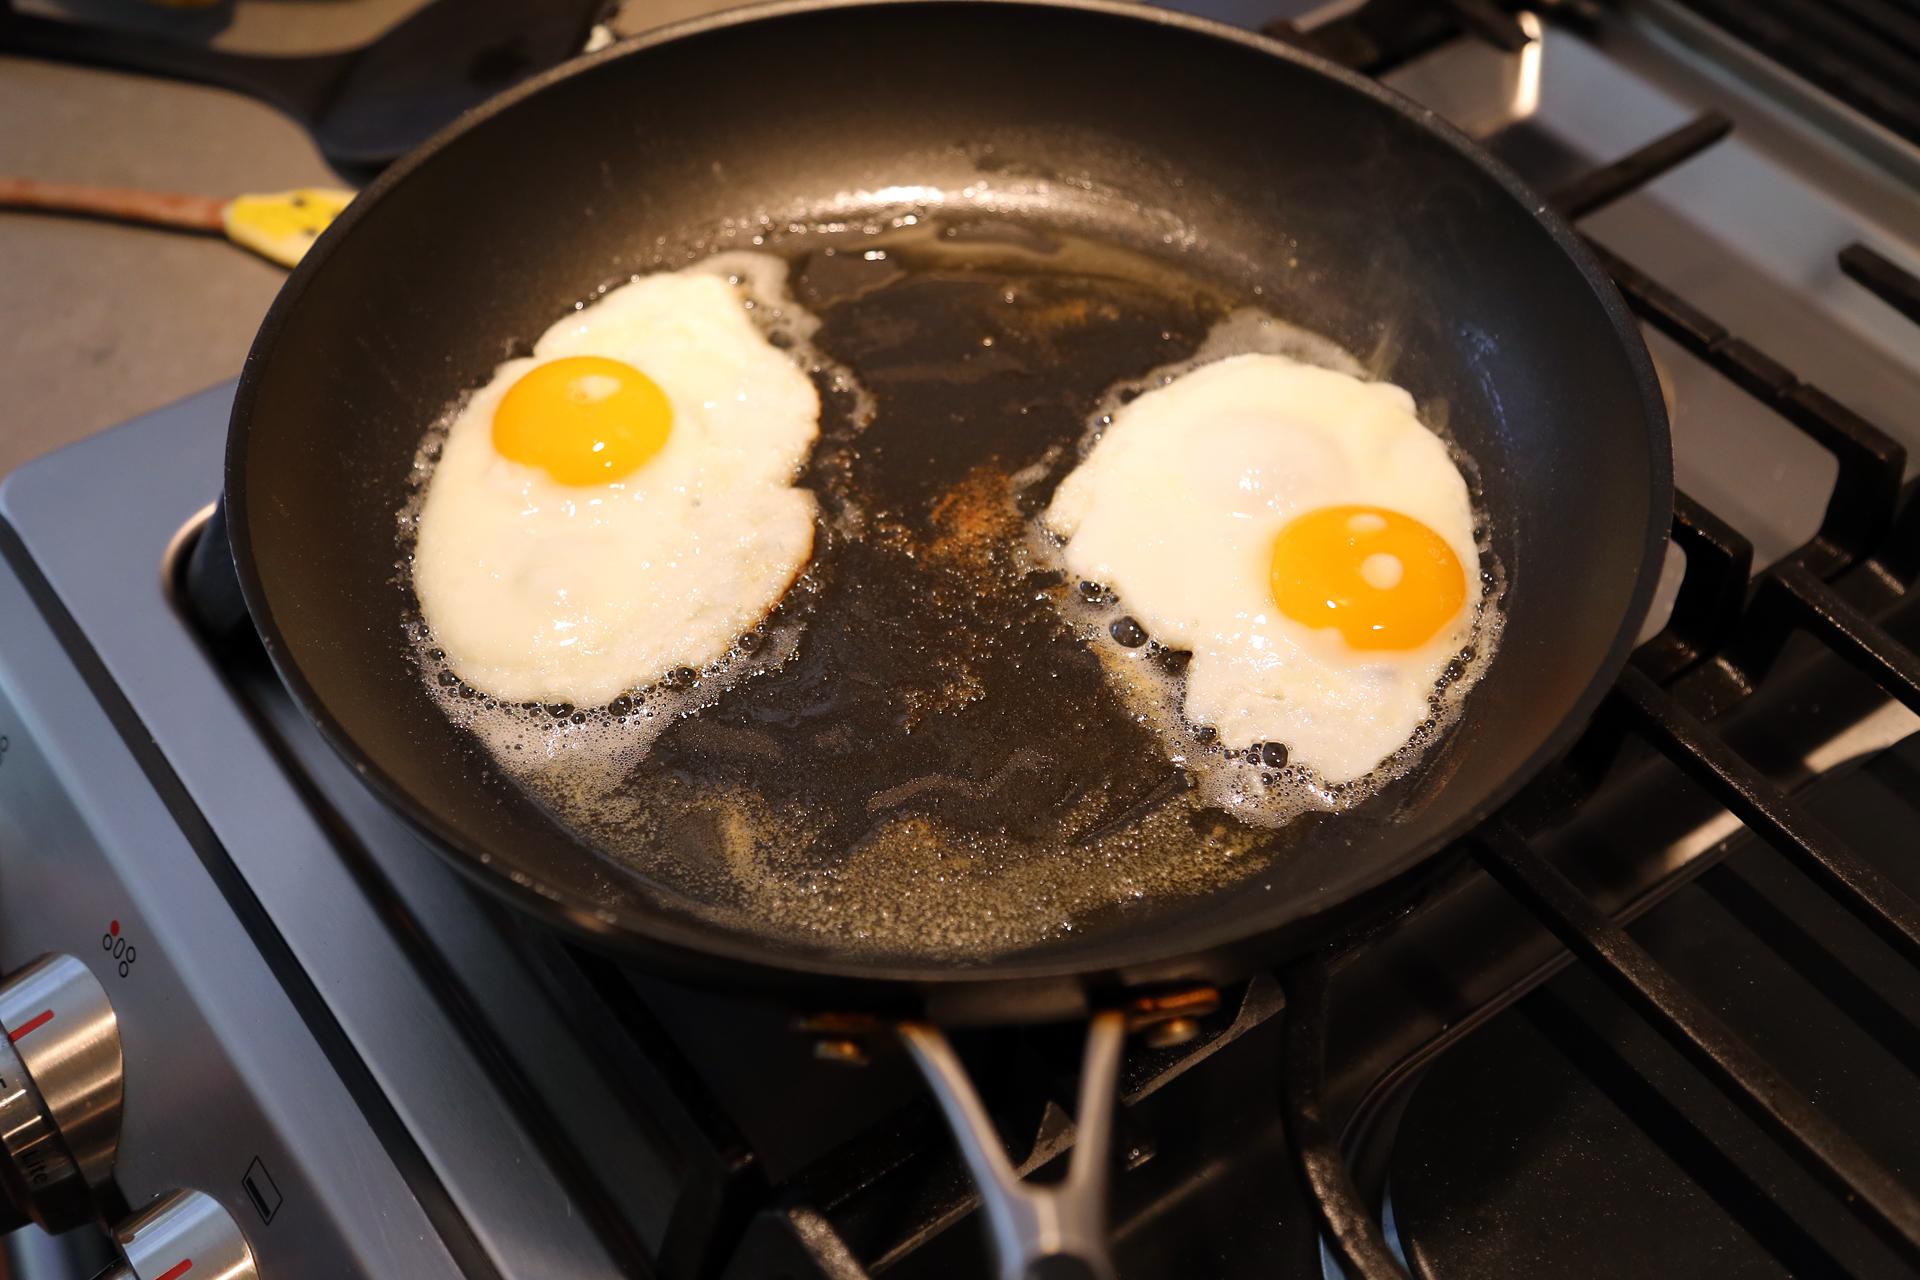 Fry the eggs to medium.